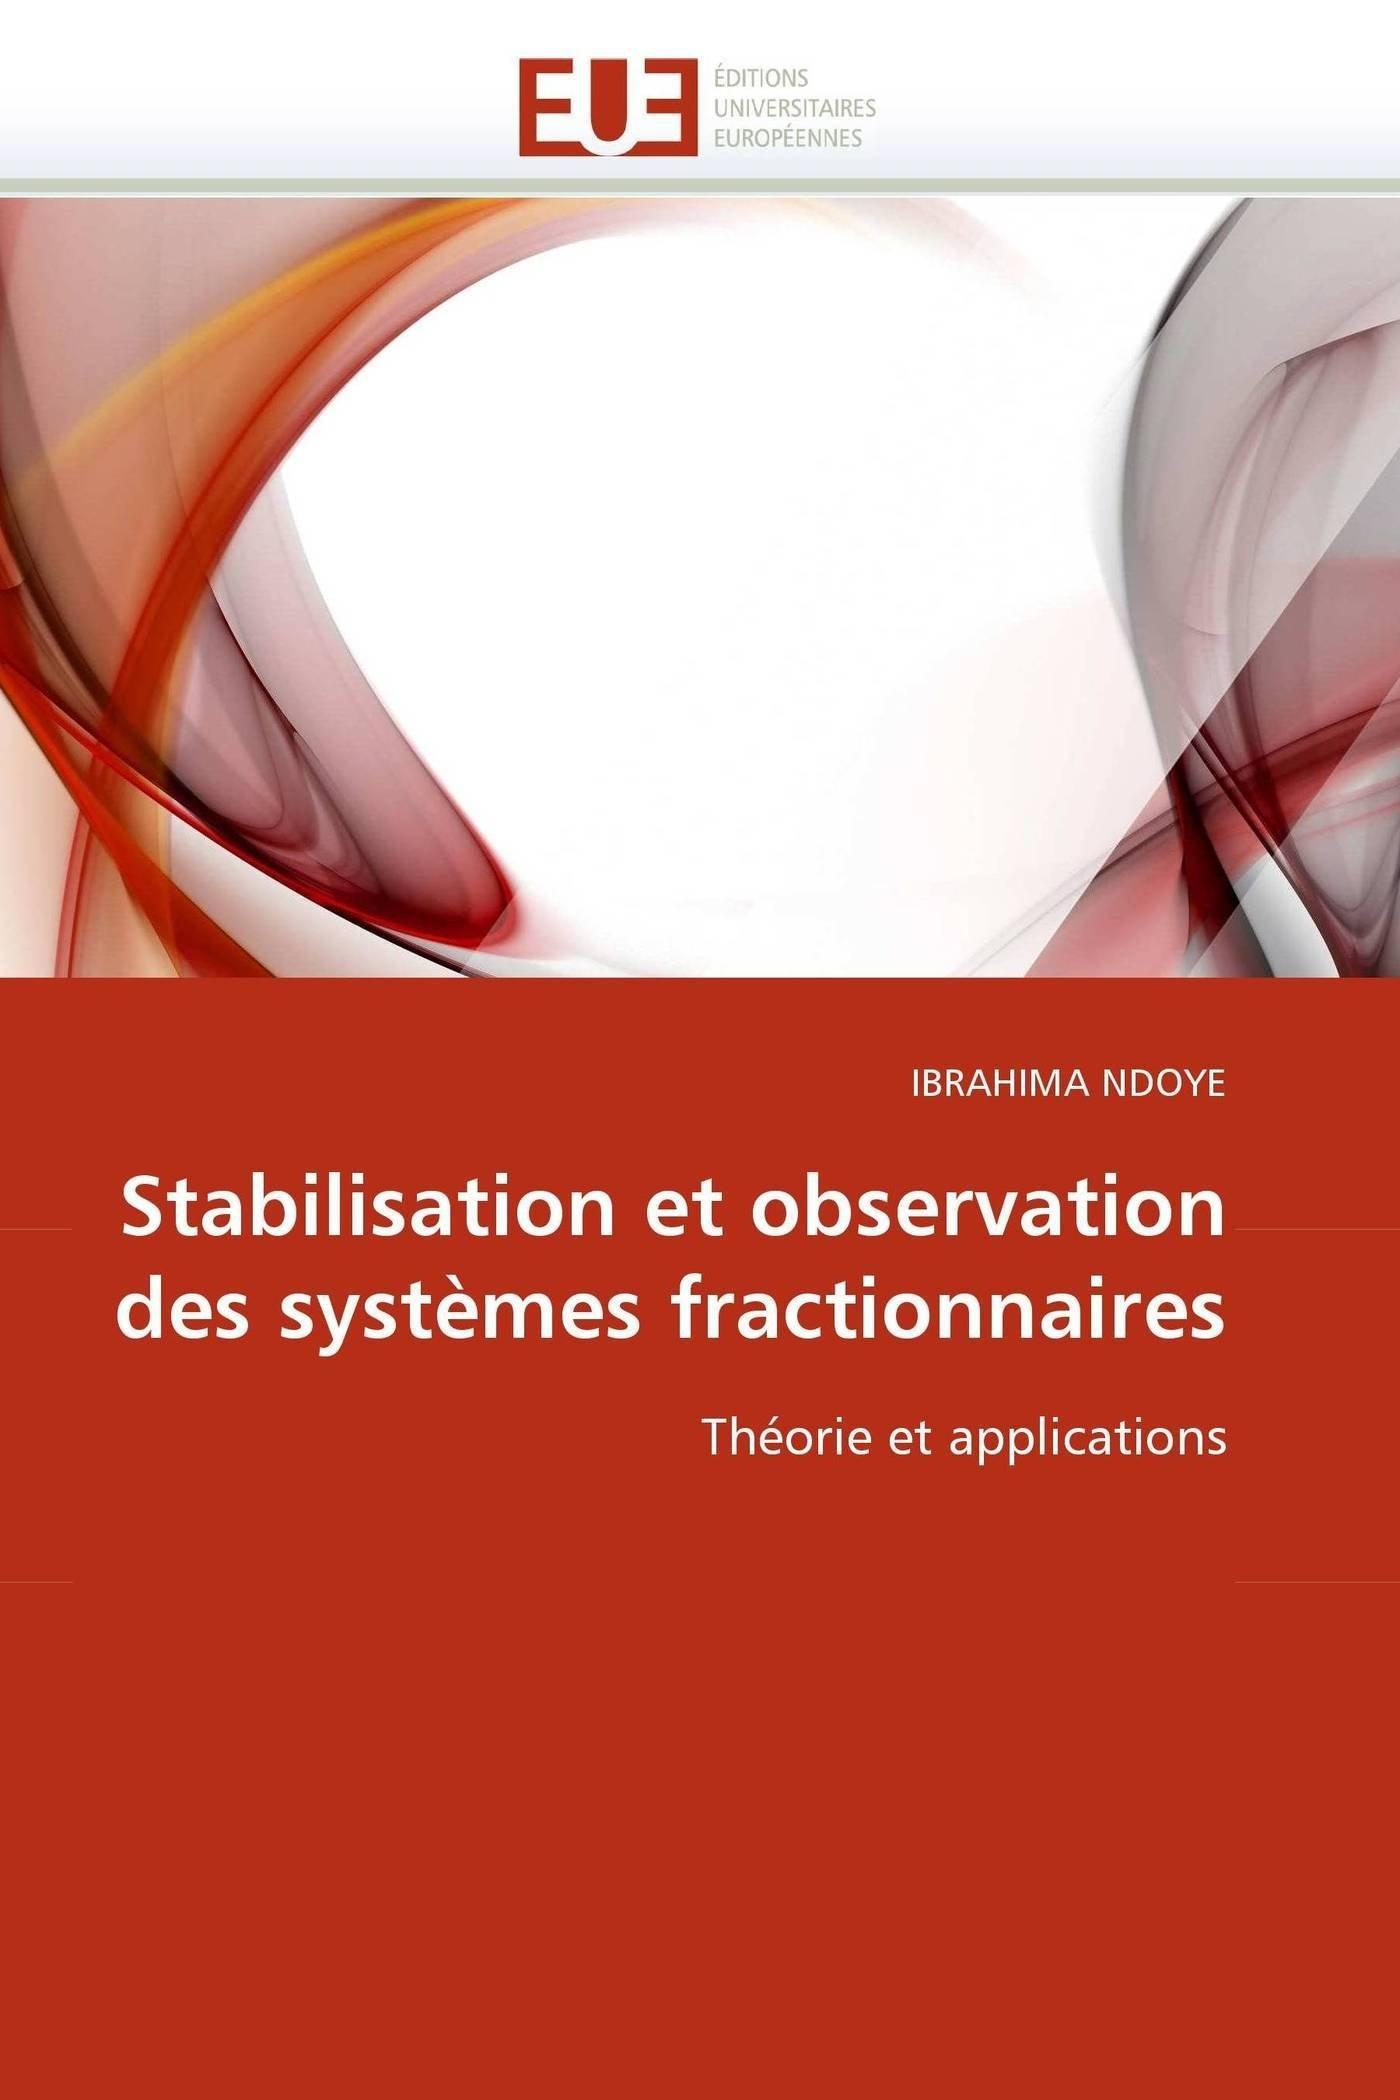 Stabilisation et observation des systèmes fractionnaires: Théorie et applications (Omn.Univ.Europ.) (French Edition) ebook